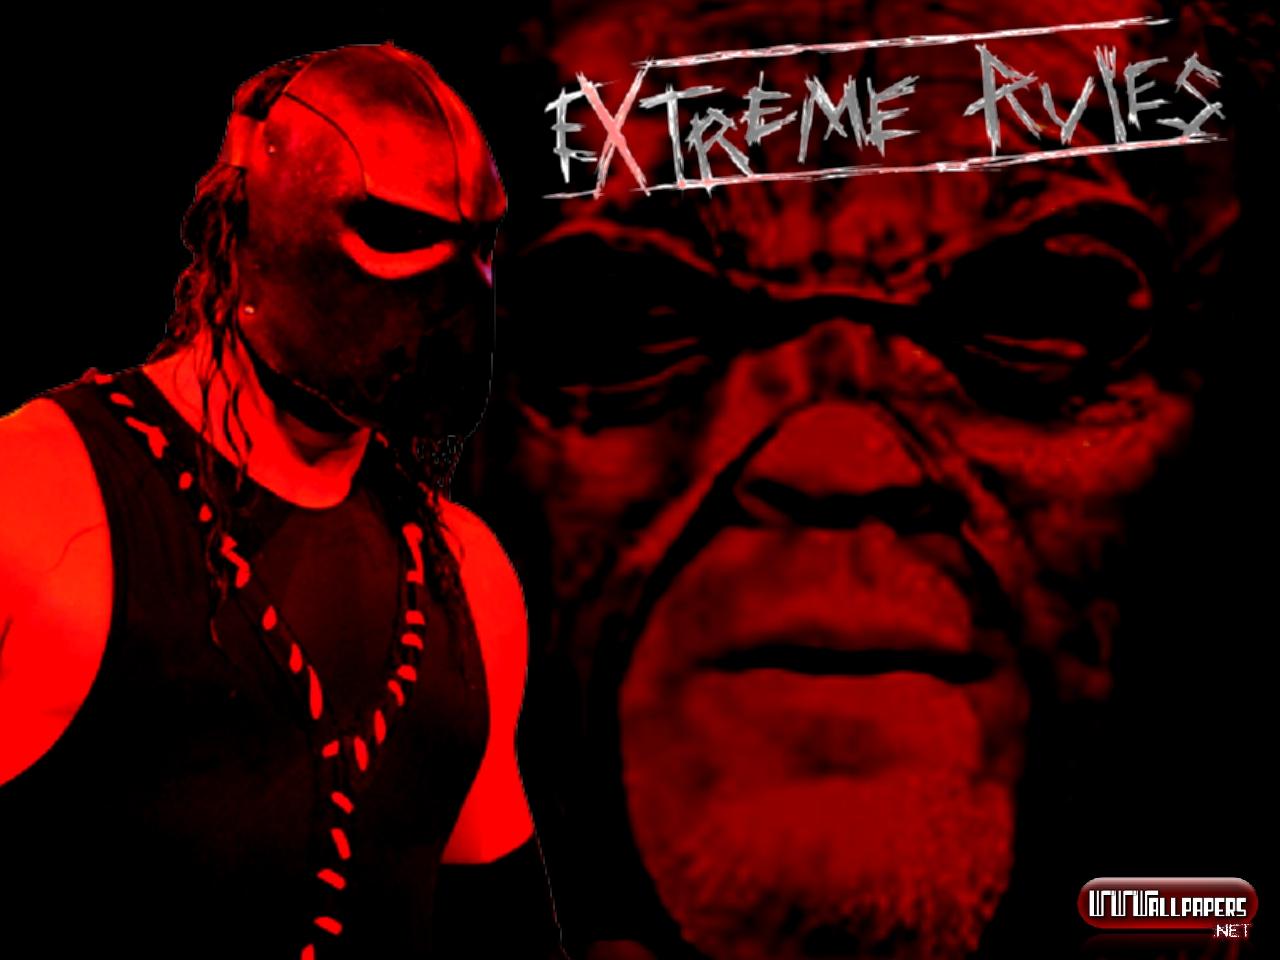 Ver Wwe Extreme Rules 2013 En Vivo Y En Espaol Extreme Rules 2015